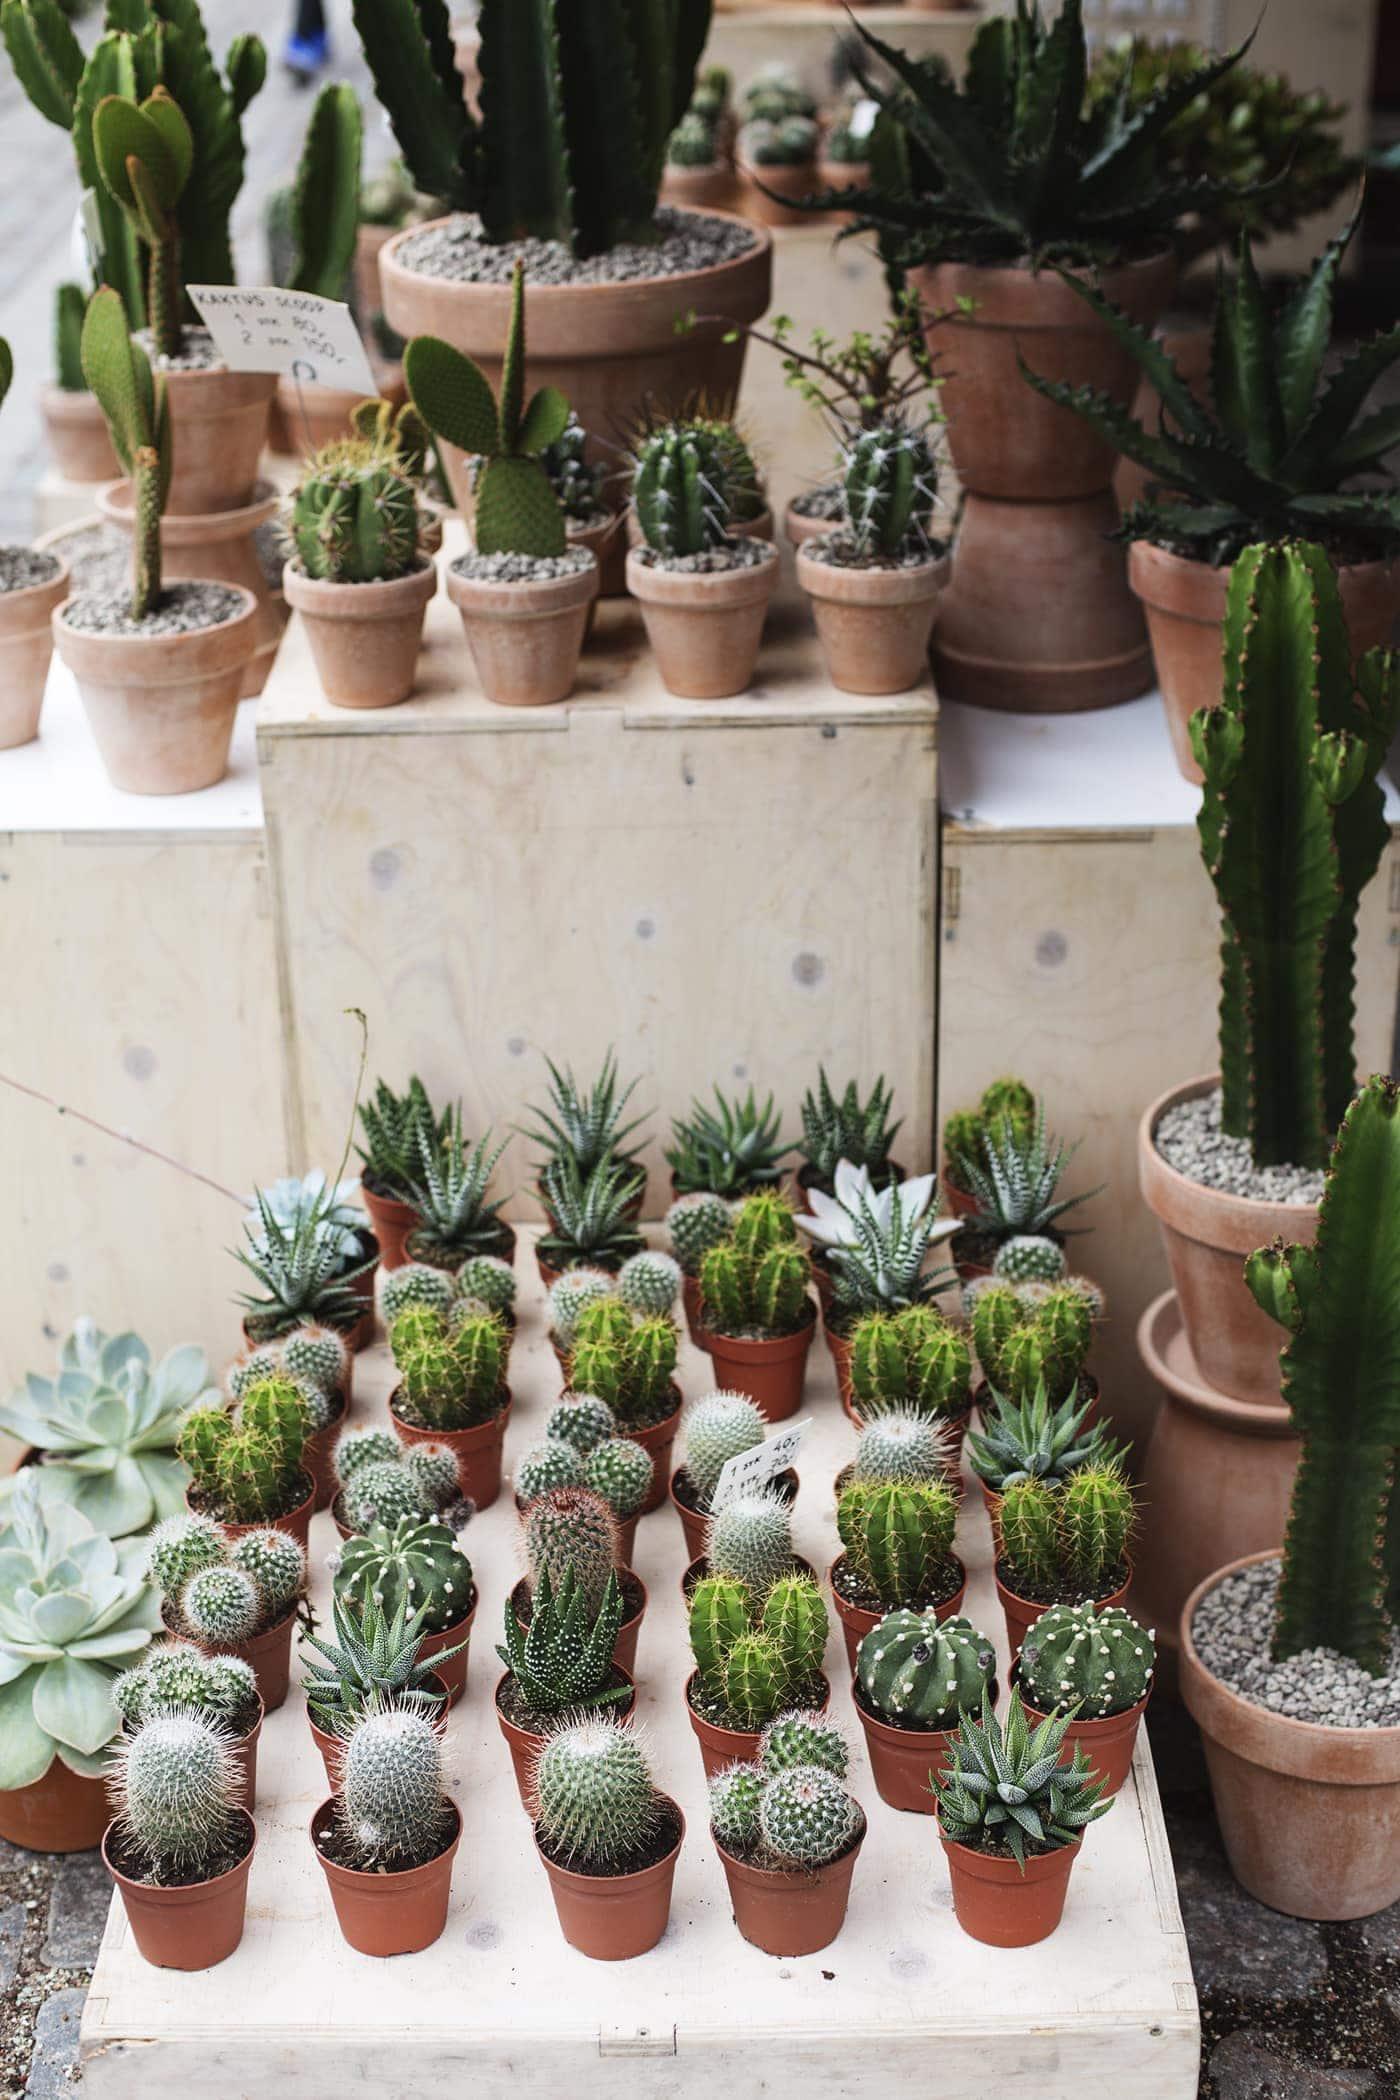 Copenhagen | wanderlust | Kaktus stand | house plants